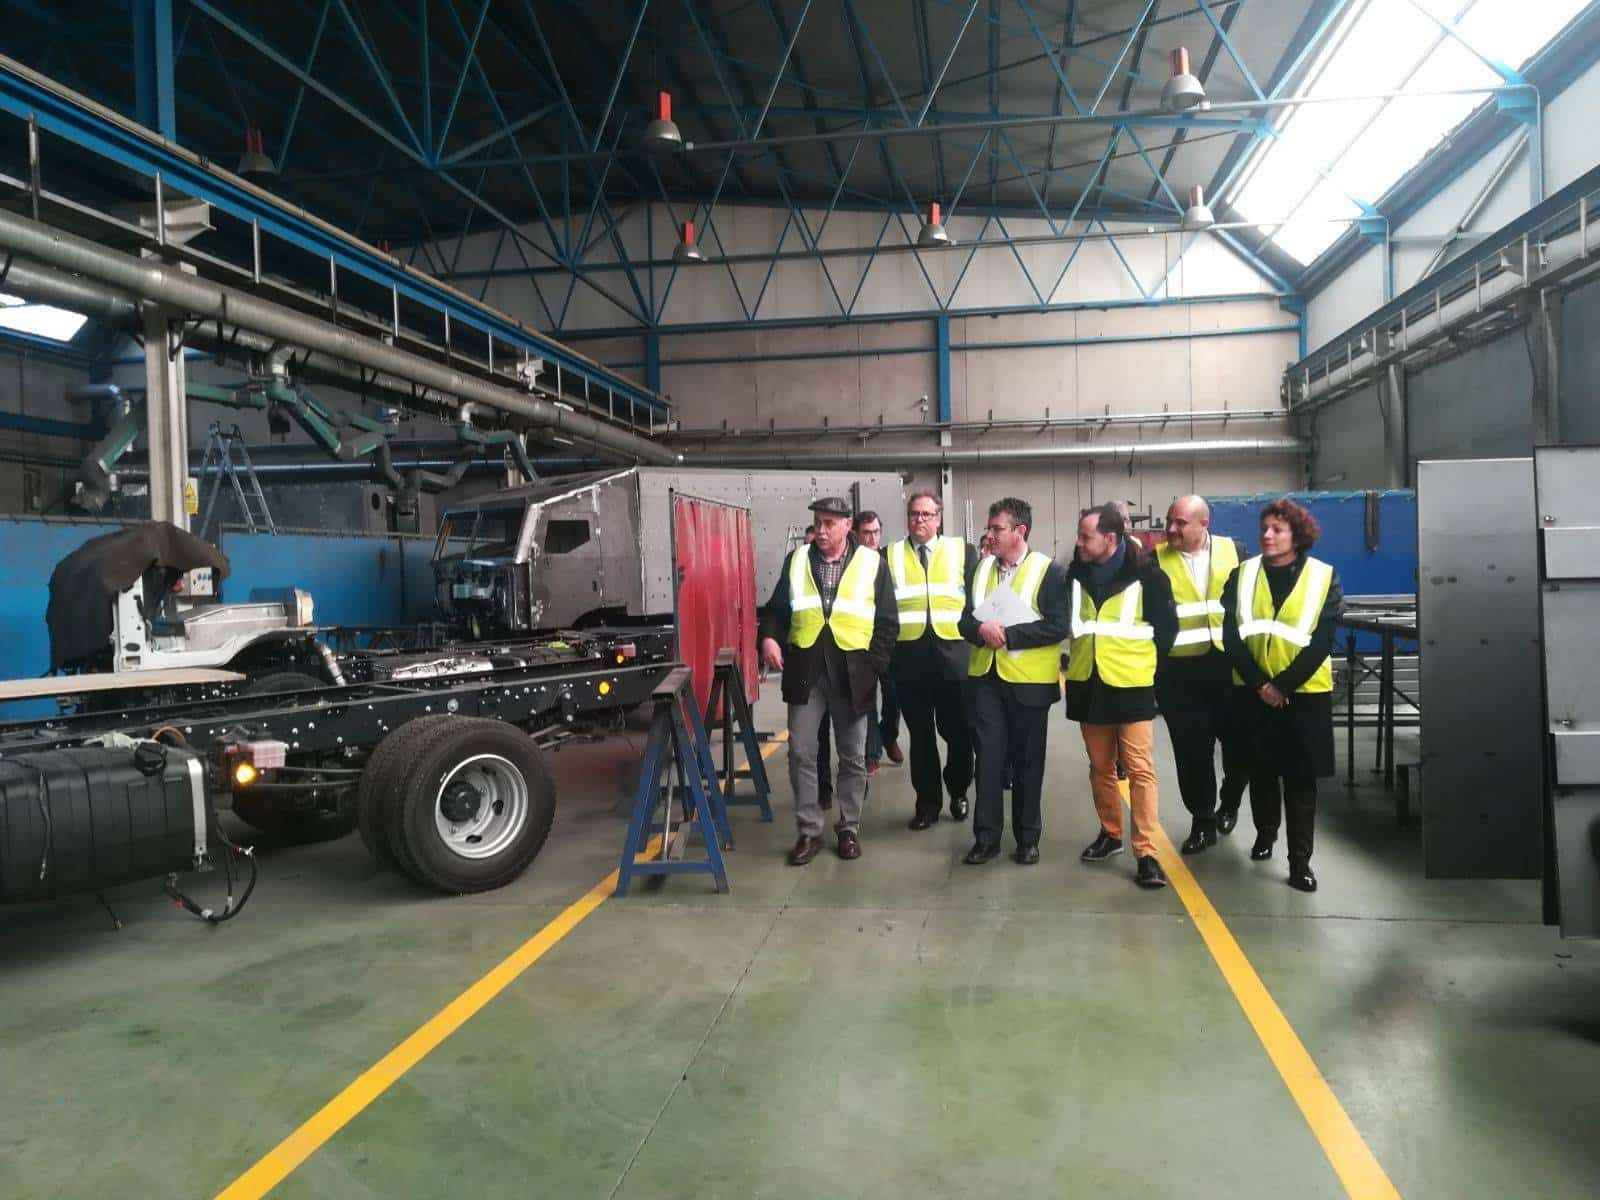 tsi diviseguro proyecto CREA - Director General de Empleo visitó TSD-DIVISEGUR en Herencia